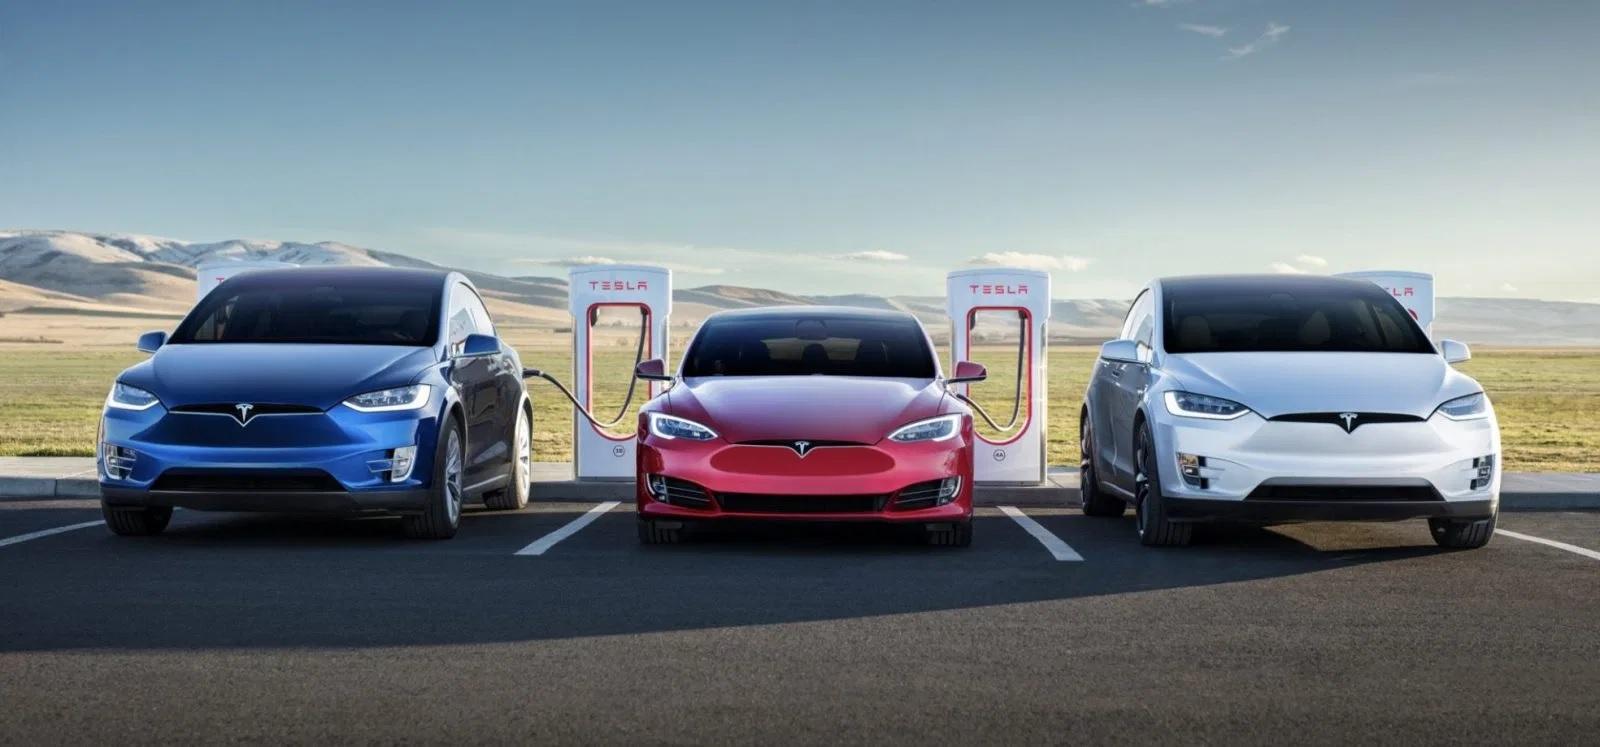 Tesla Model X, Model S, Model 3